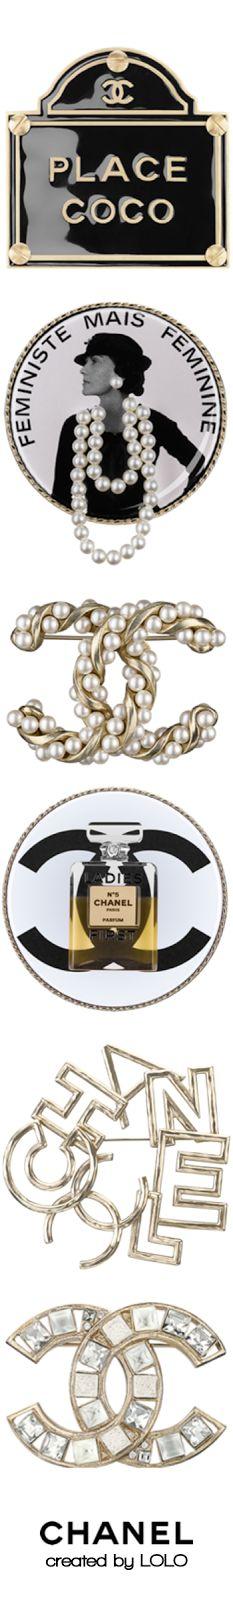 LOOKandLOVEwithLOLO: Chanel Spring-Summer 2015 Accessories -ShazB